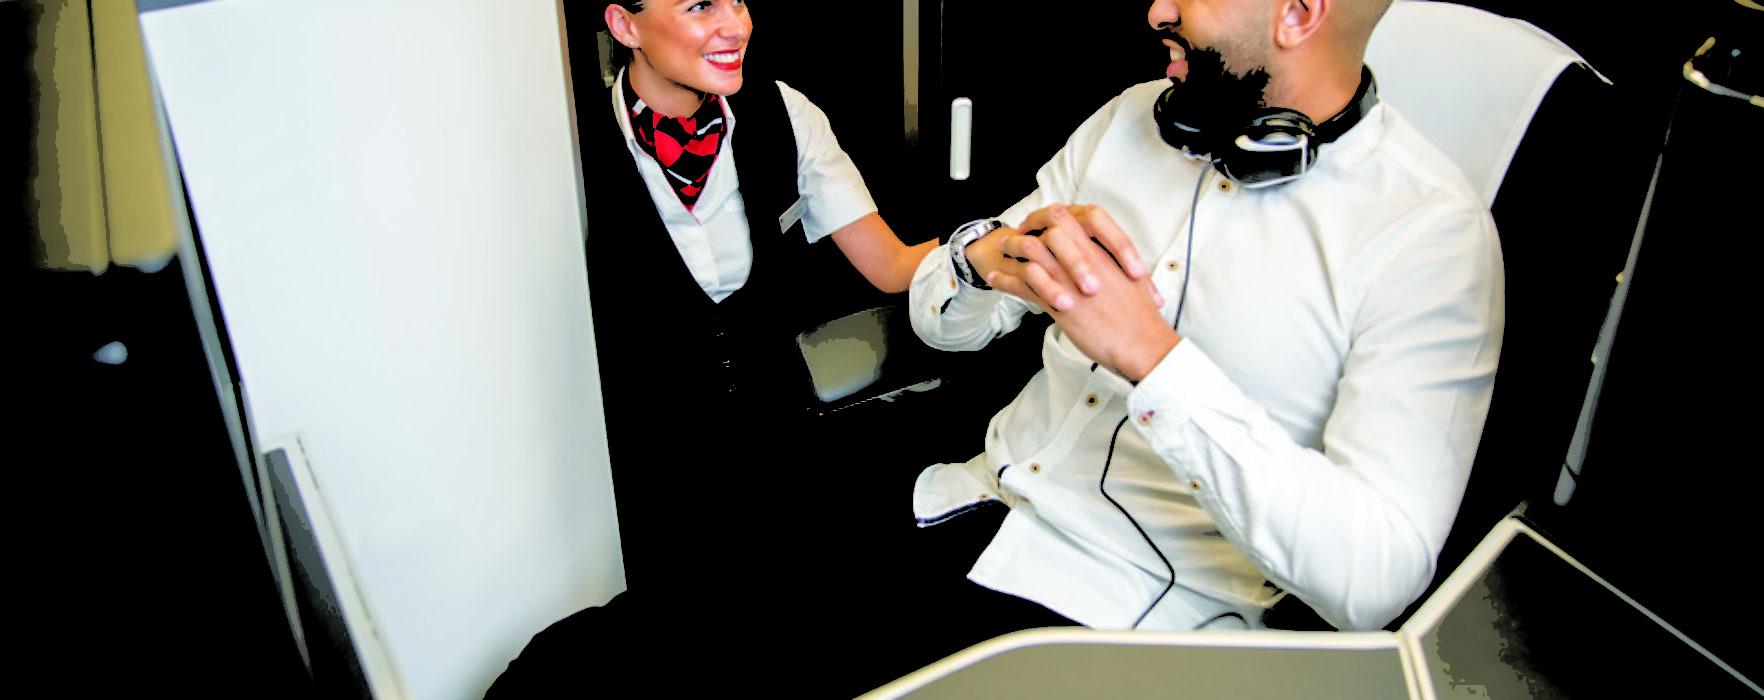 British Airways unveils new business class 'Club-Suites